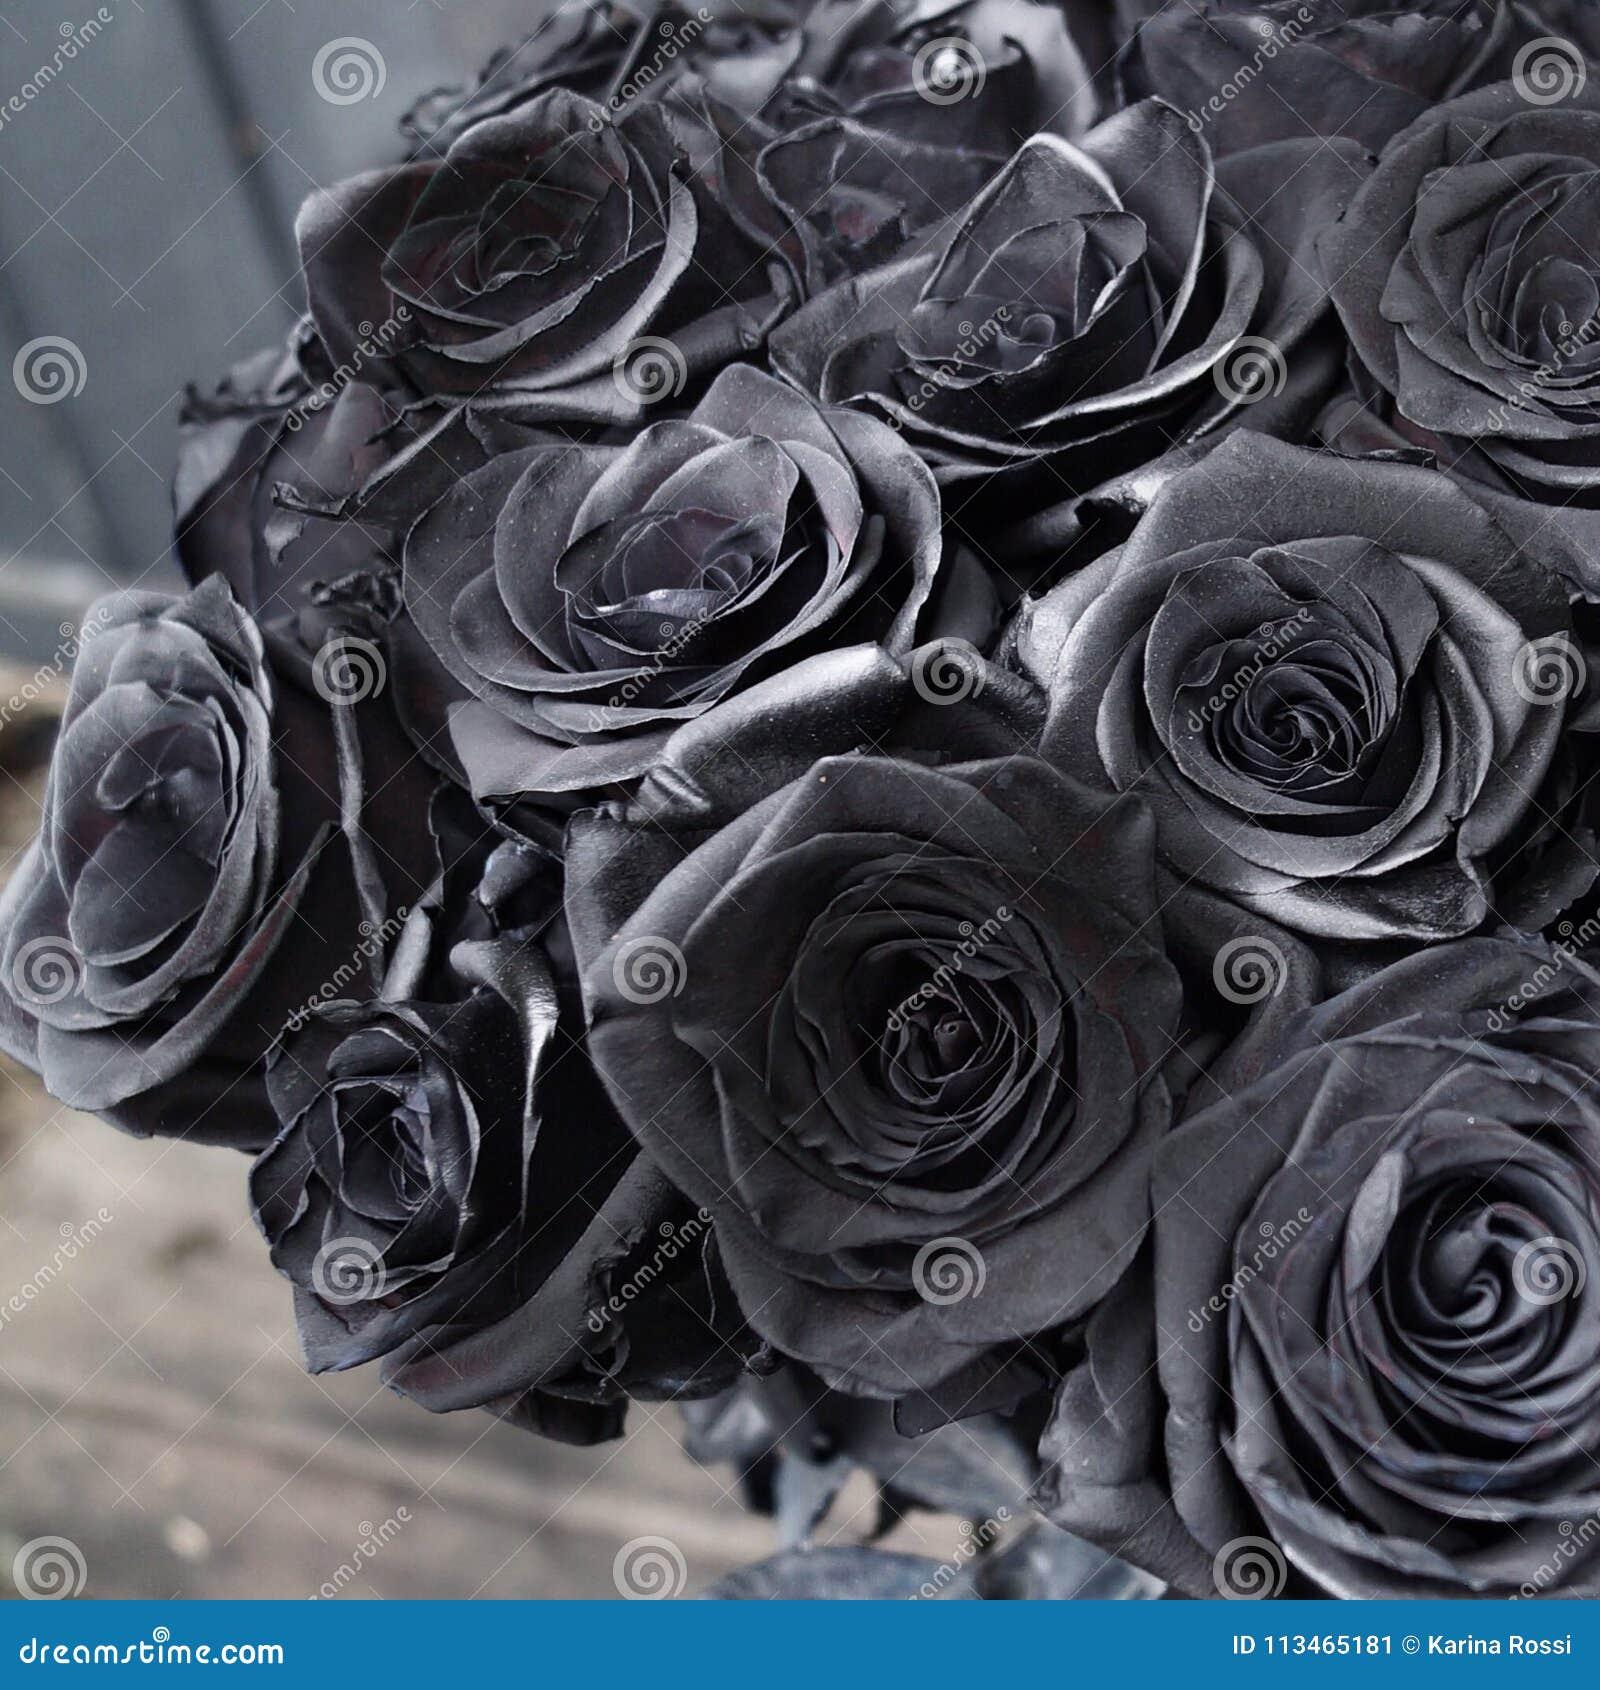 Black roses stock image image of roses flower rare 113465181 these beautiful black roses are so rare izmirmasajfo